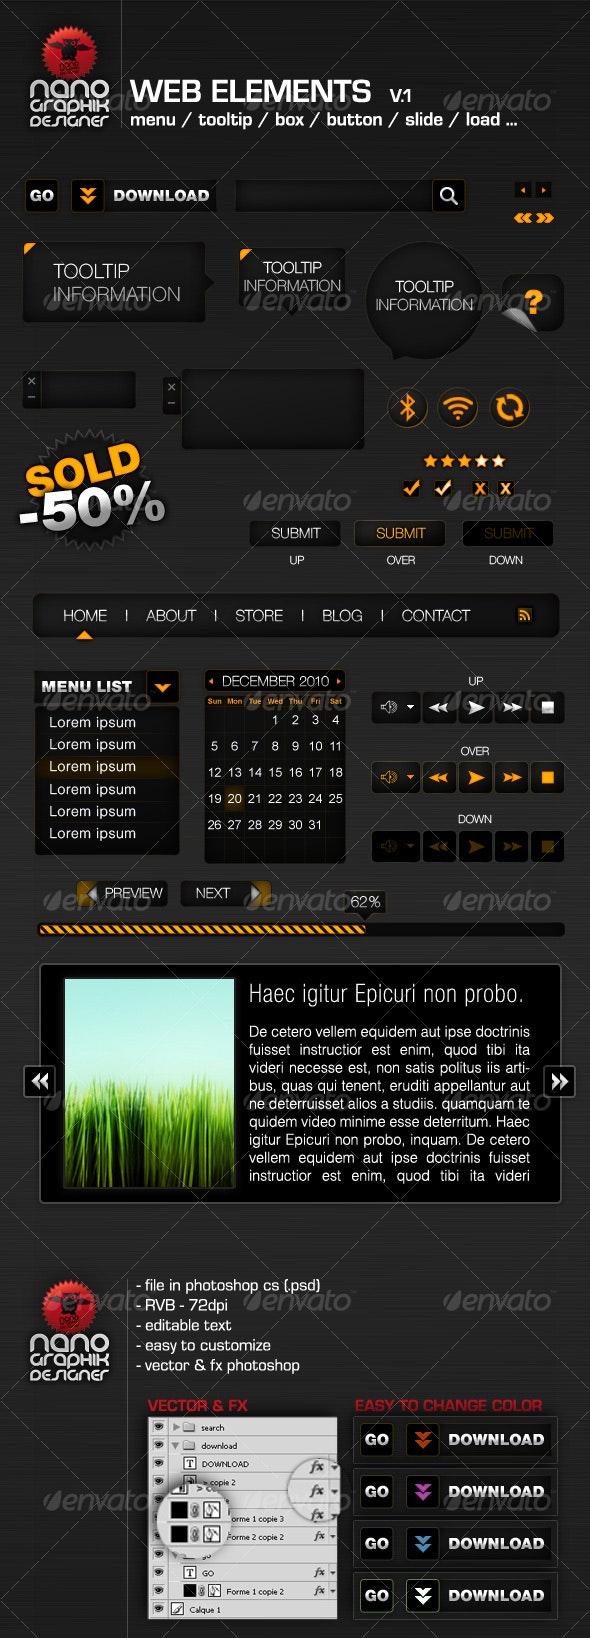 web elements v.1 - Web Elements